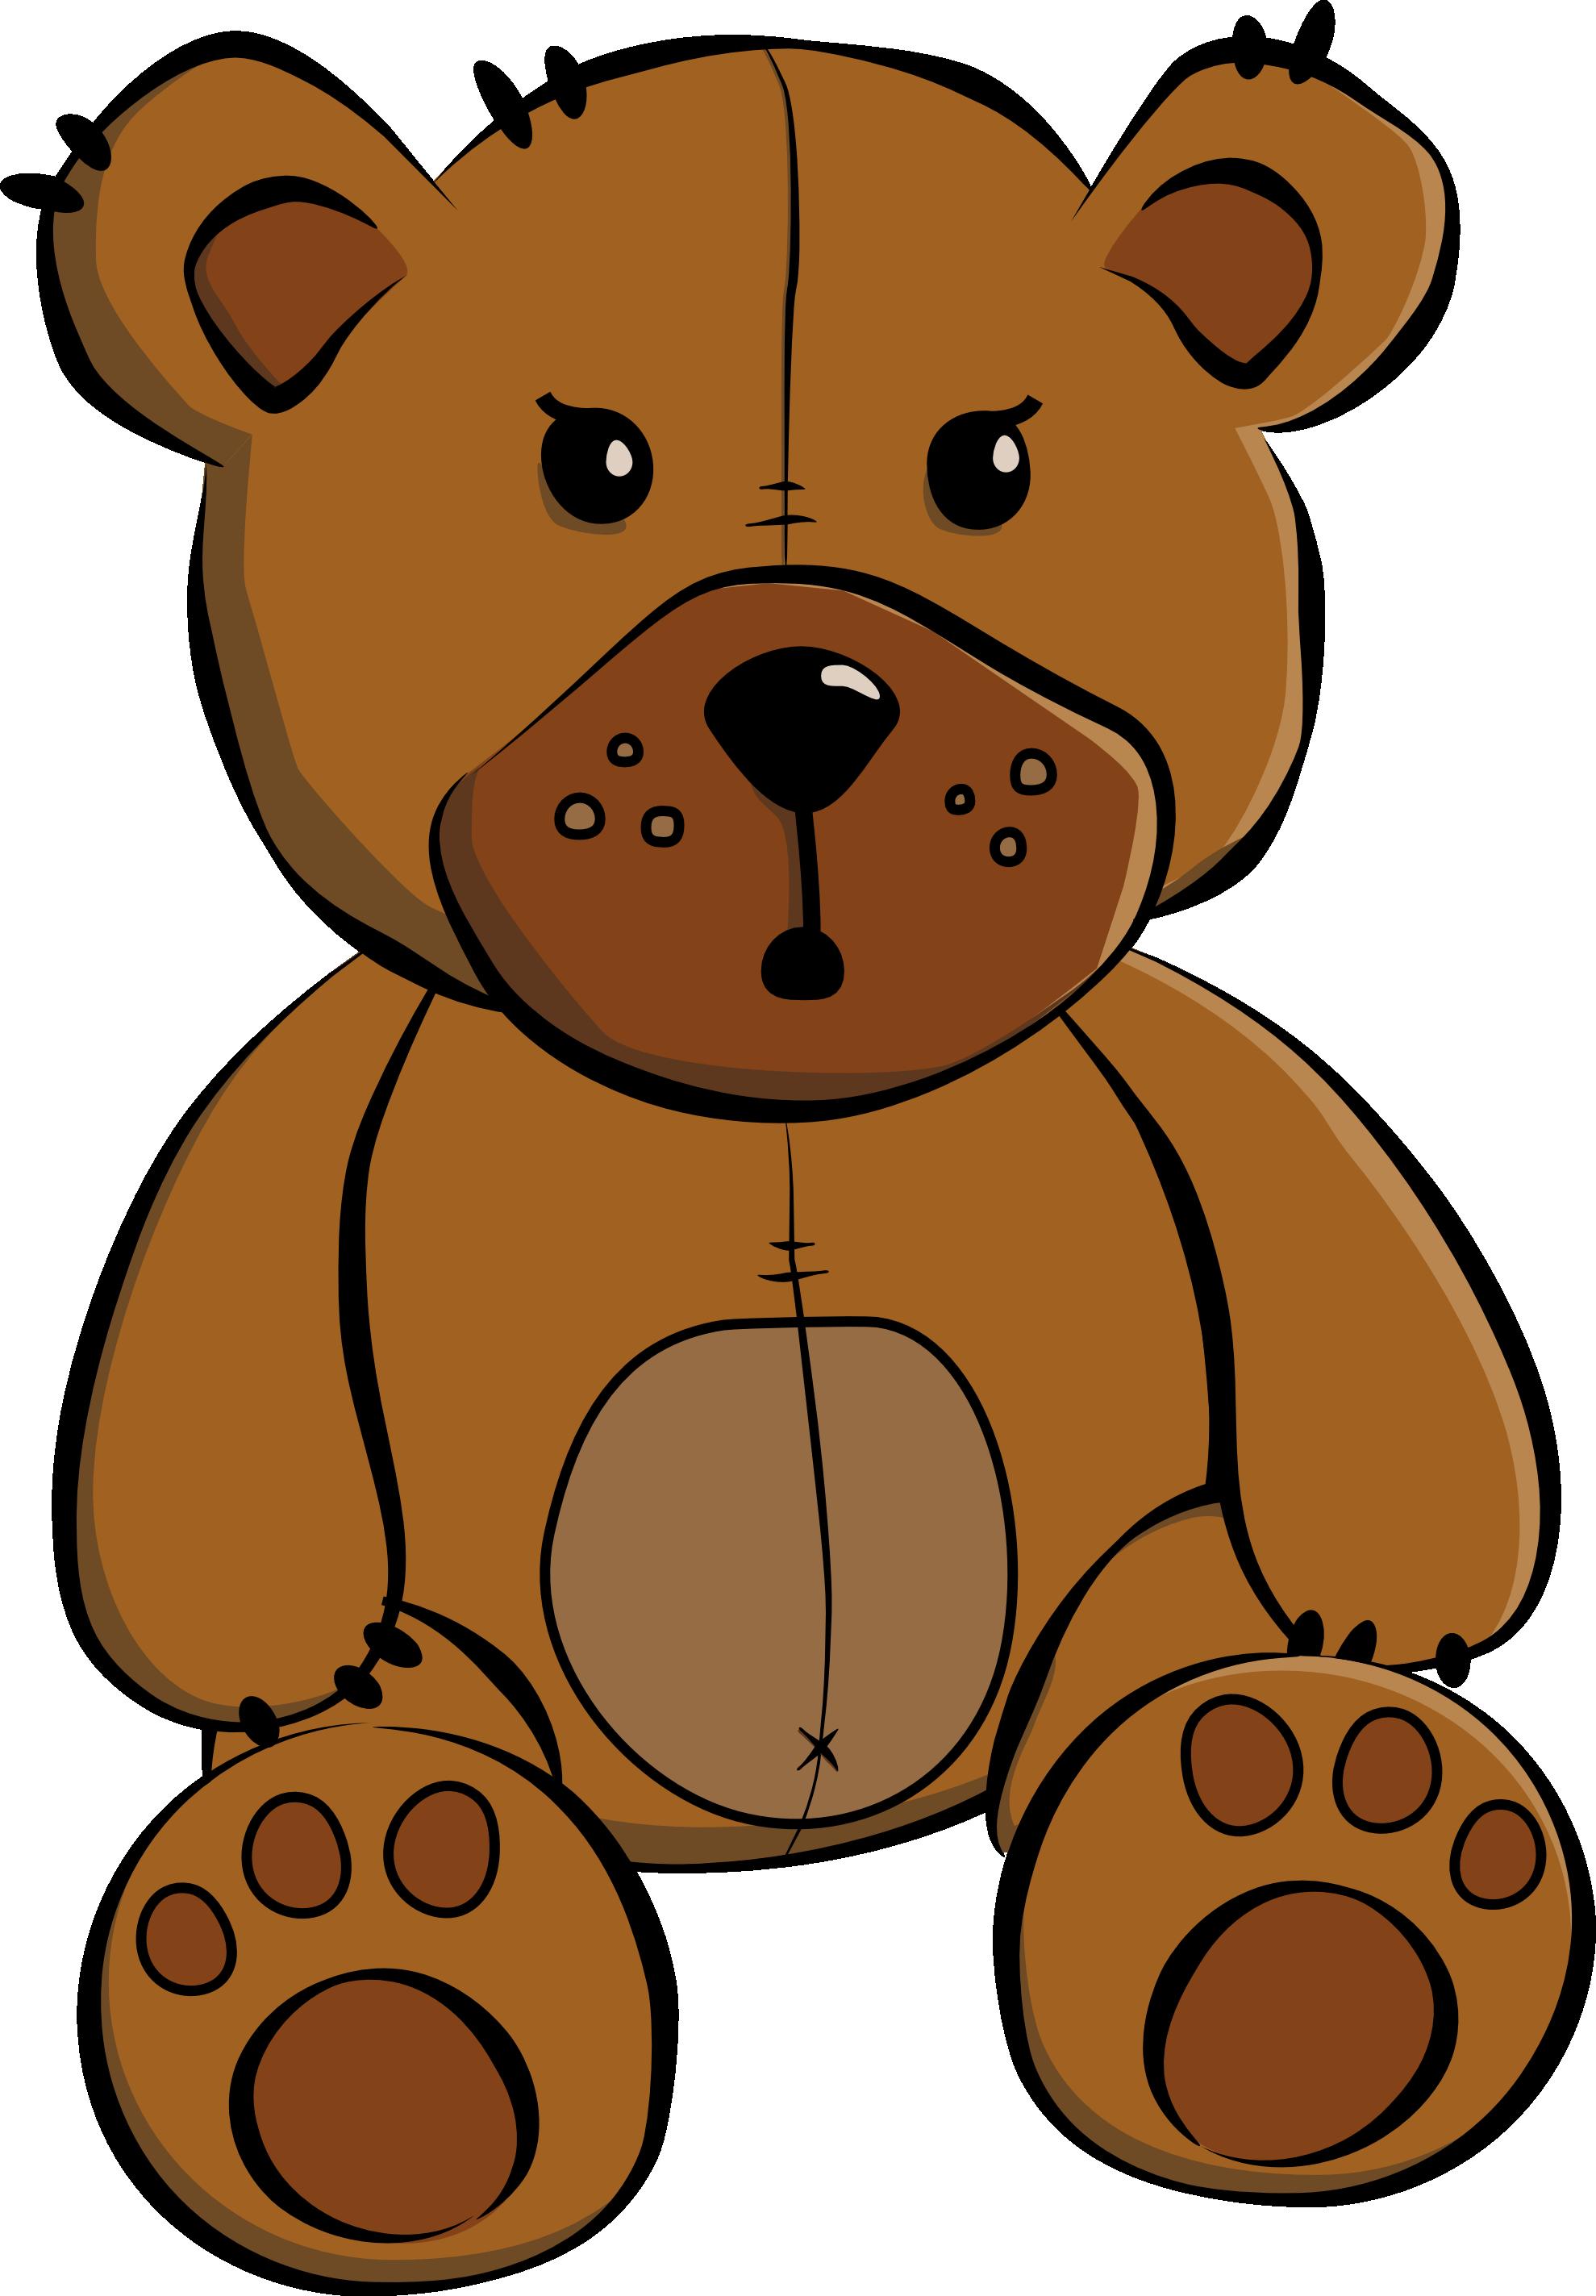 freeuse download Clip art xmas christmas. Teddy bear clipart